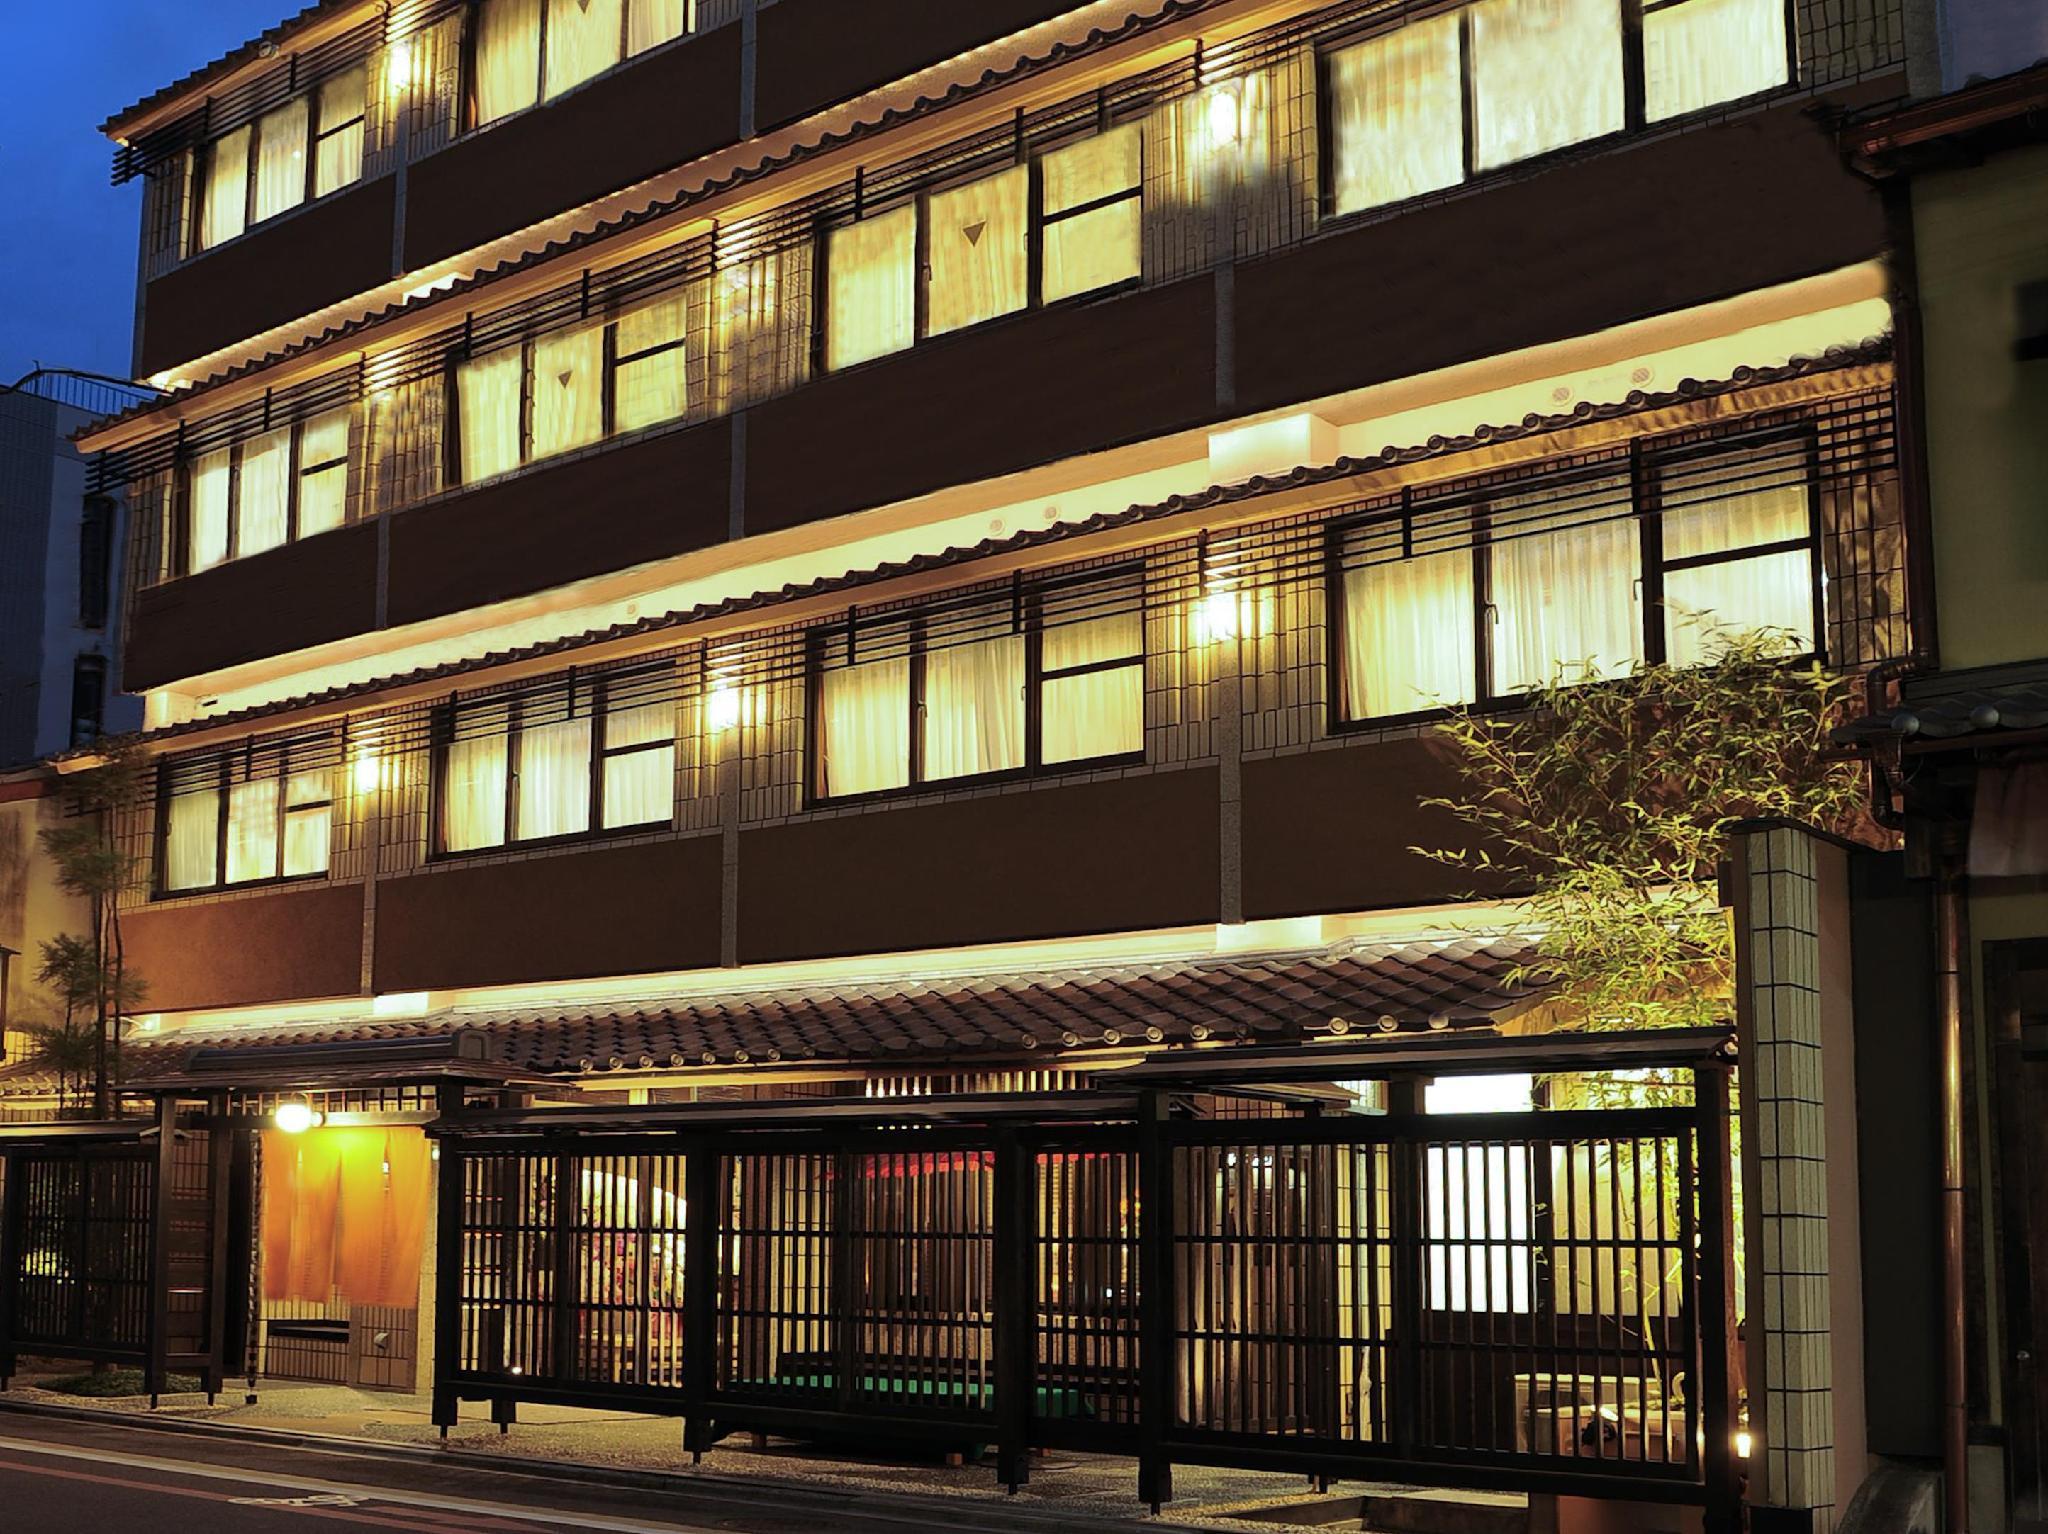 Watazen Ryokan Hotel